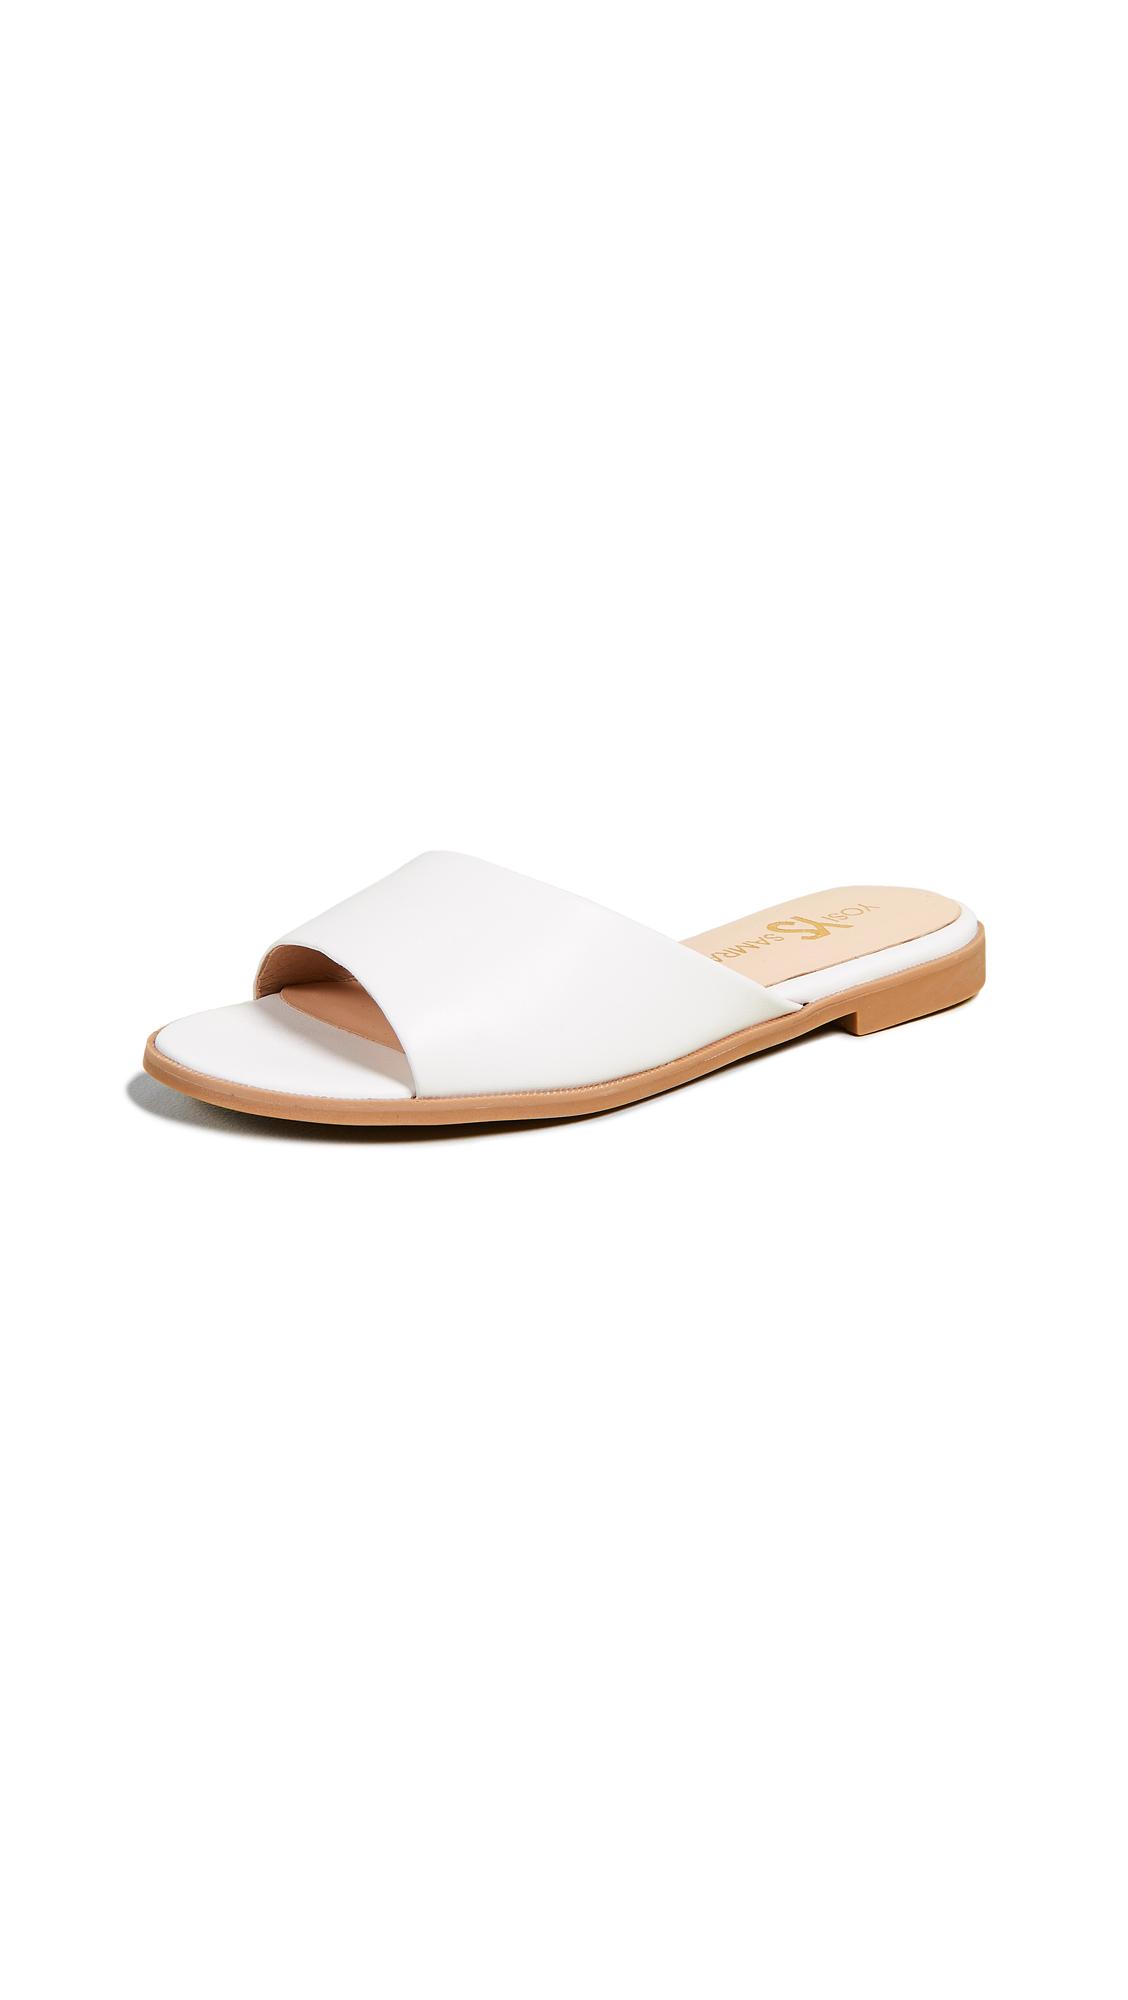 YOSI SAMRA Constantine Open Toe Flats in White